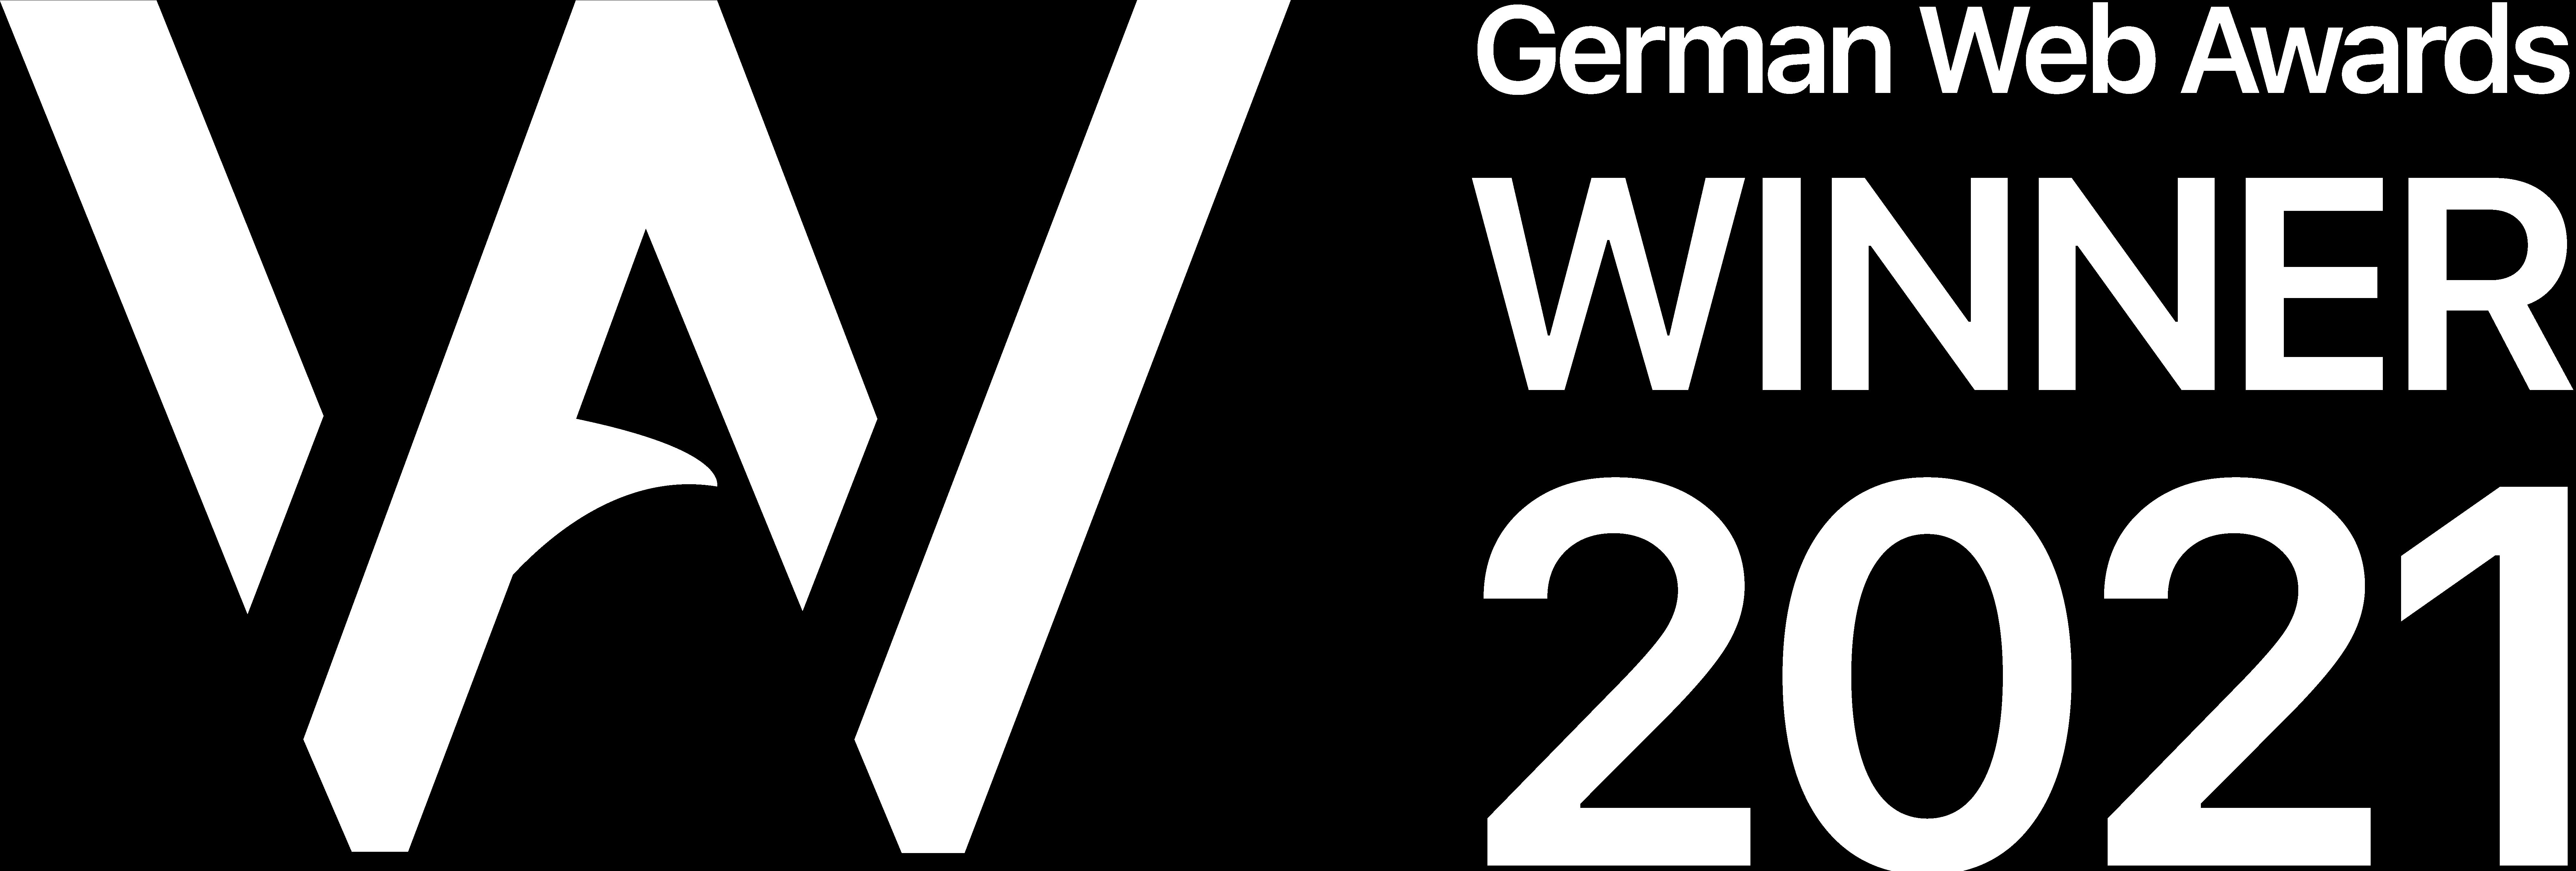 Winner German Web Award 2021